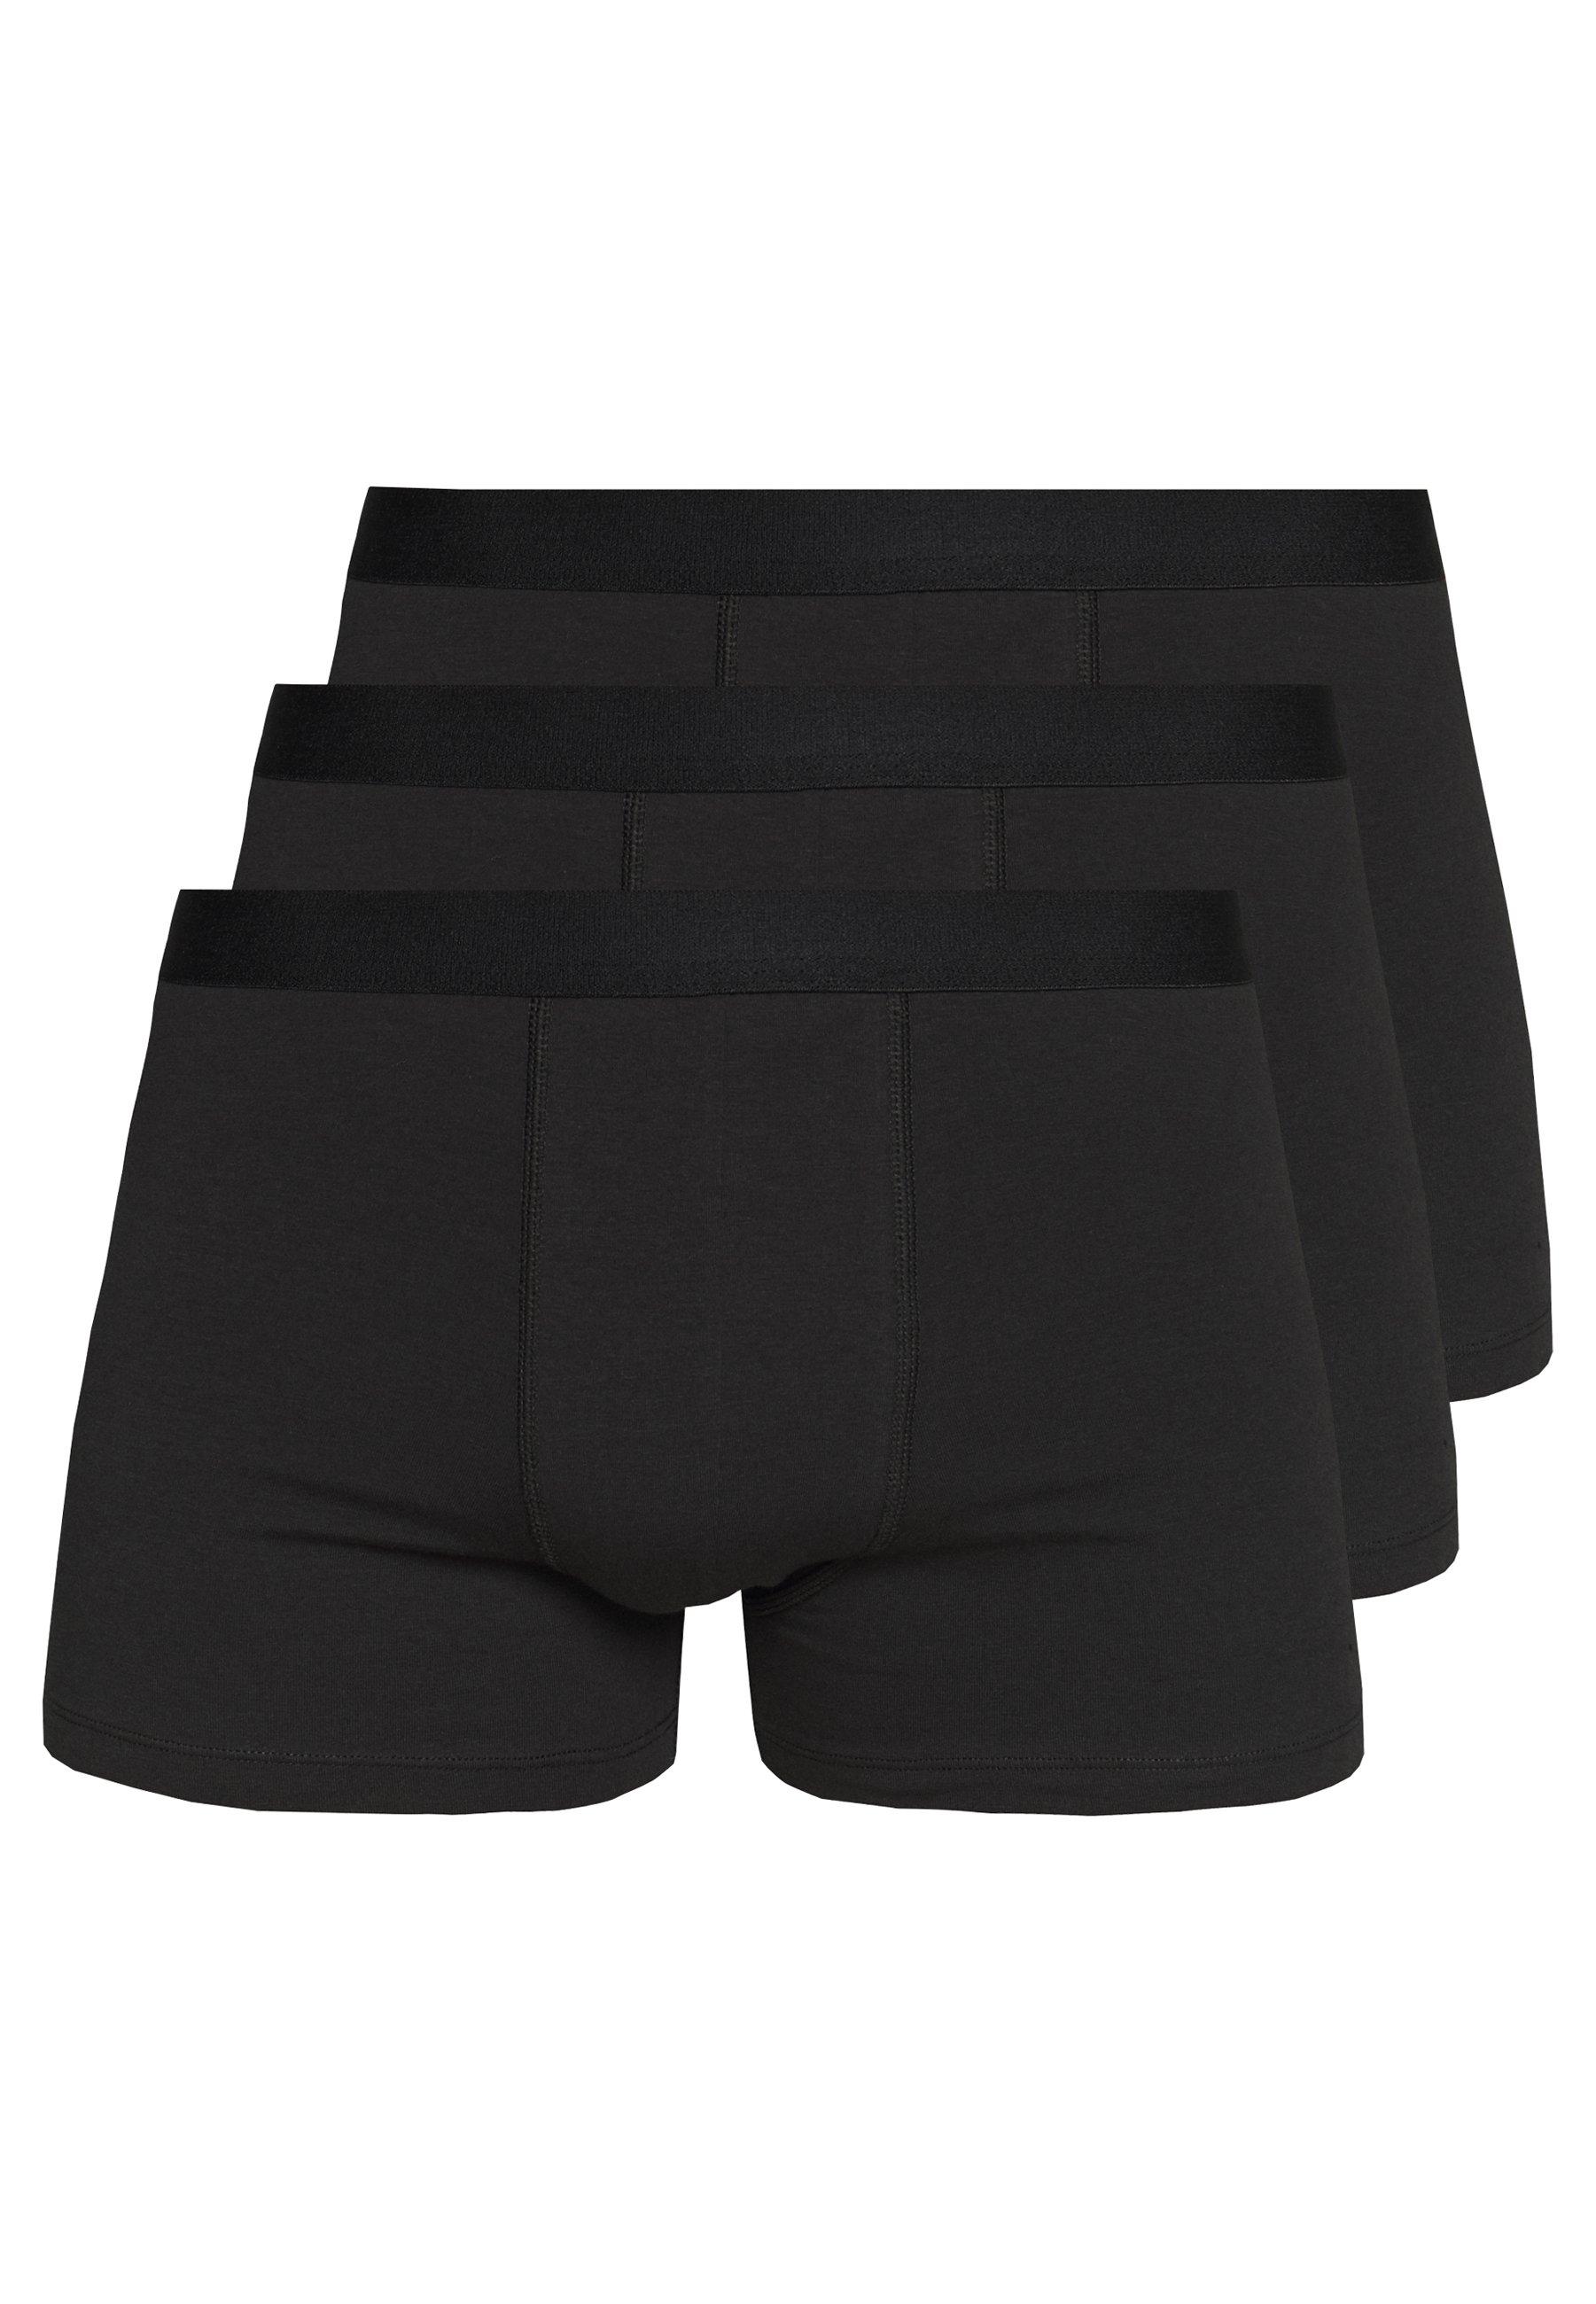 Pier One 3 Pack - Culotte Black/black/black